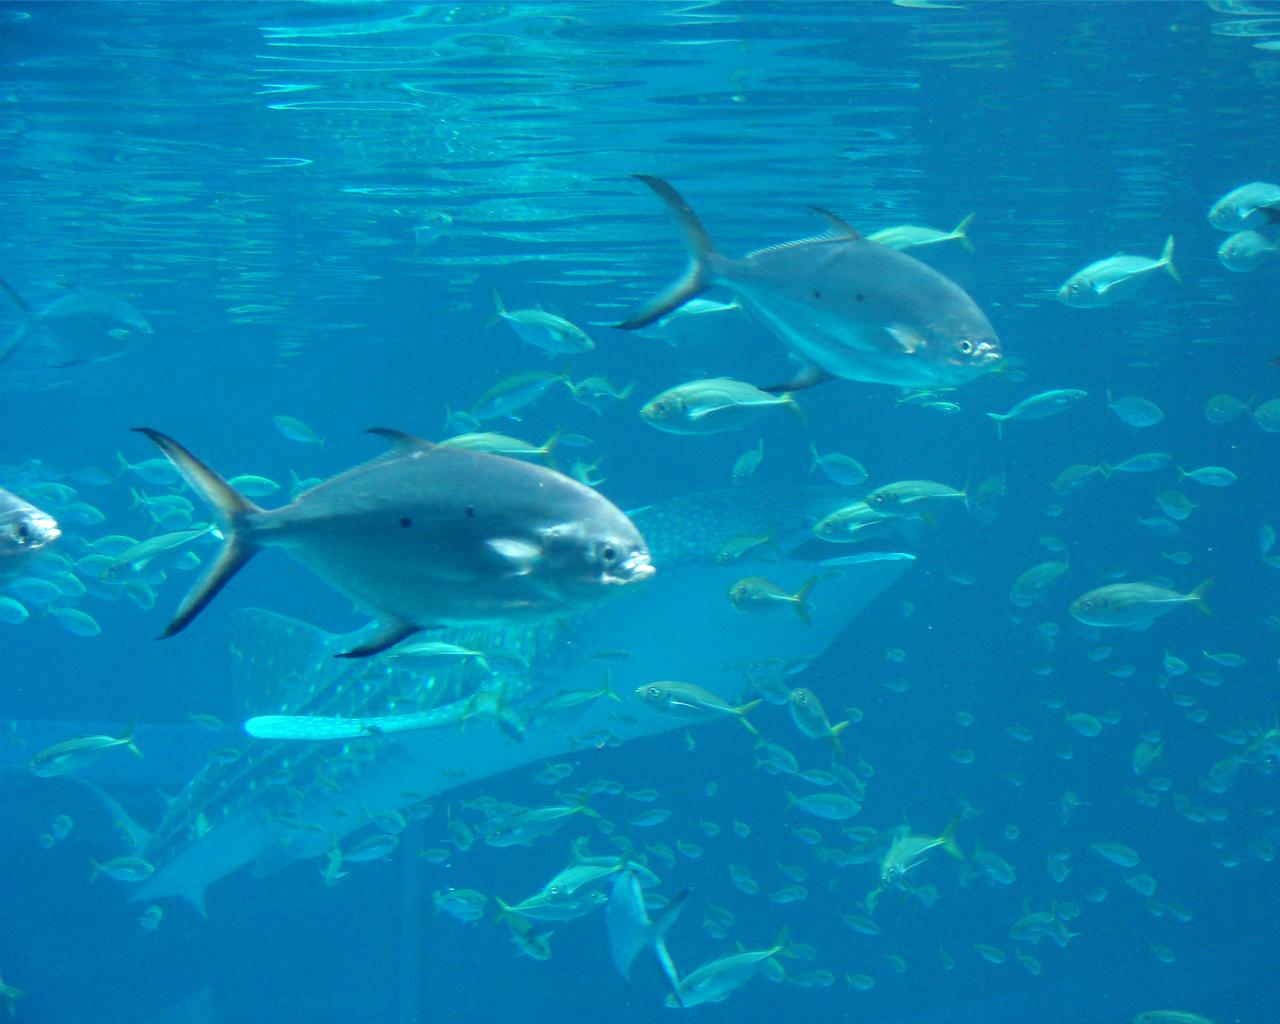 osaka aquarium whale shark by eraser851 on deviantart